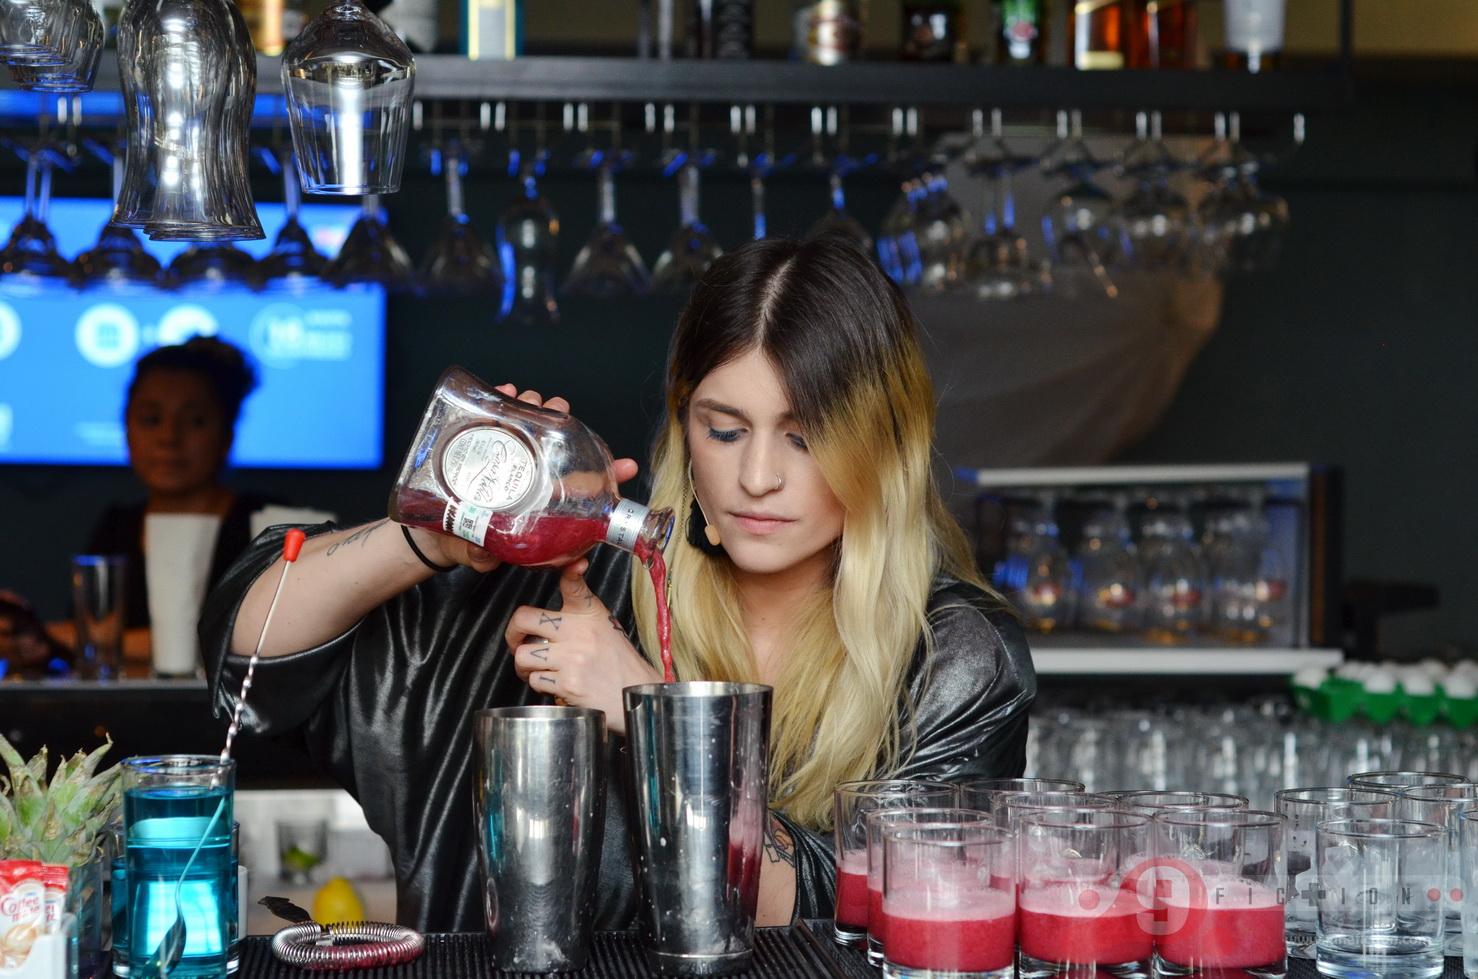 01 Cocteles Hard Rock Hotel GDL - 2019 - Foto Salvador Tabares - Nine Fiction 001